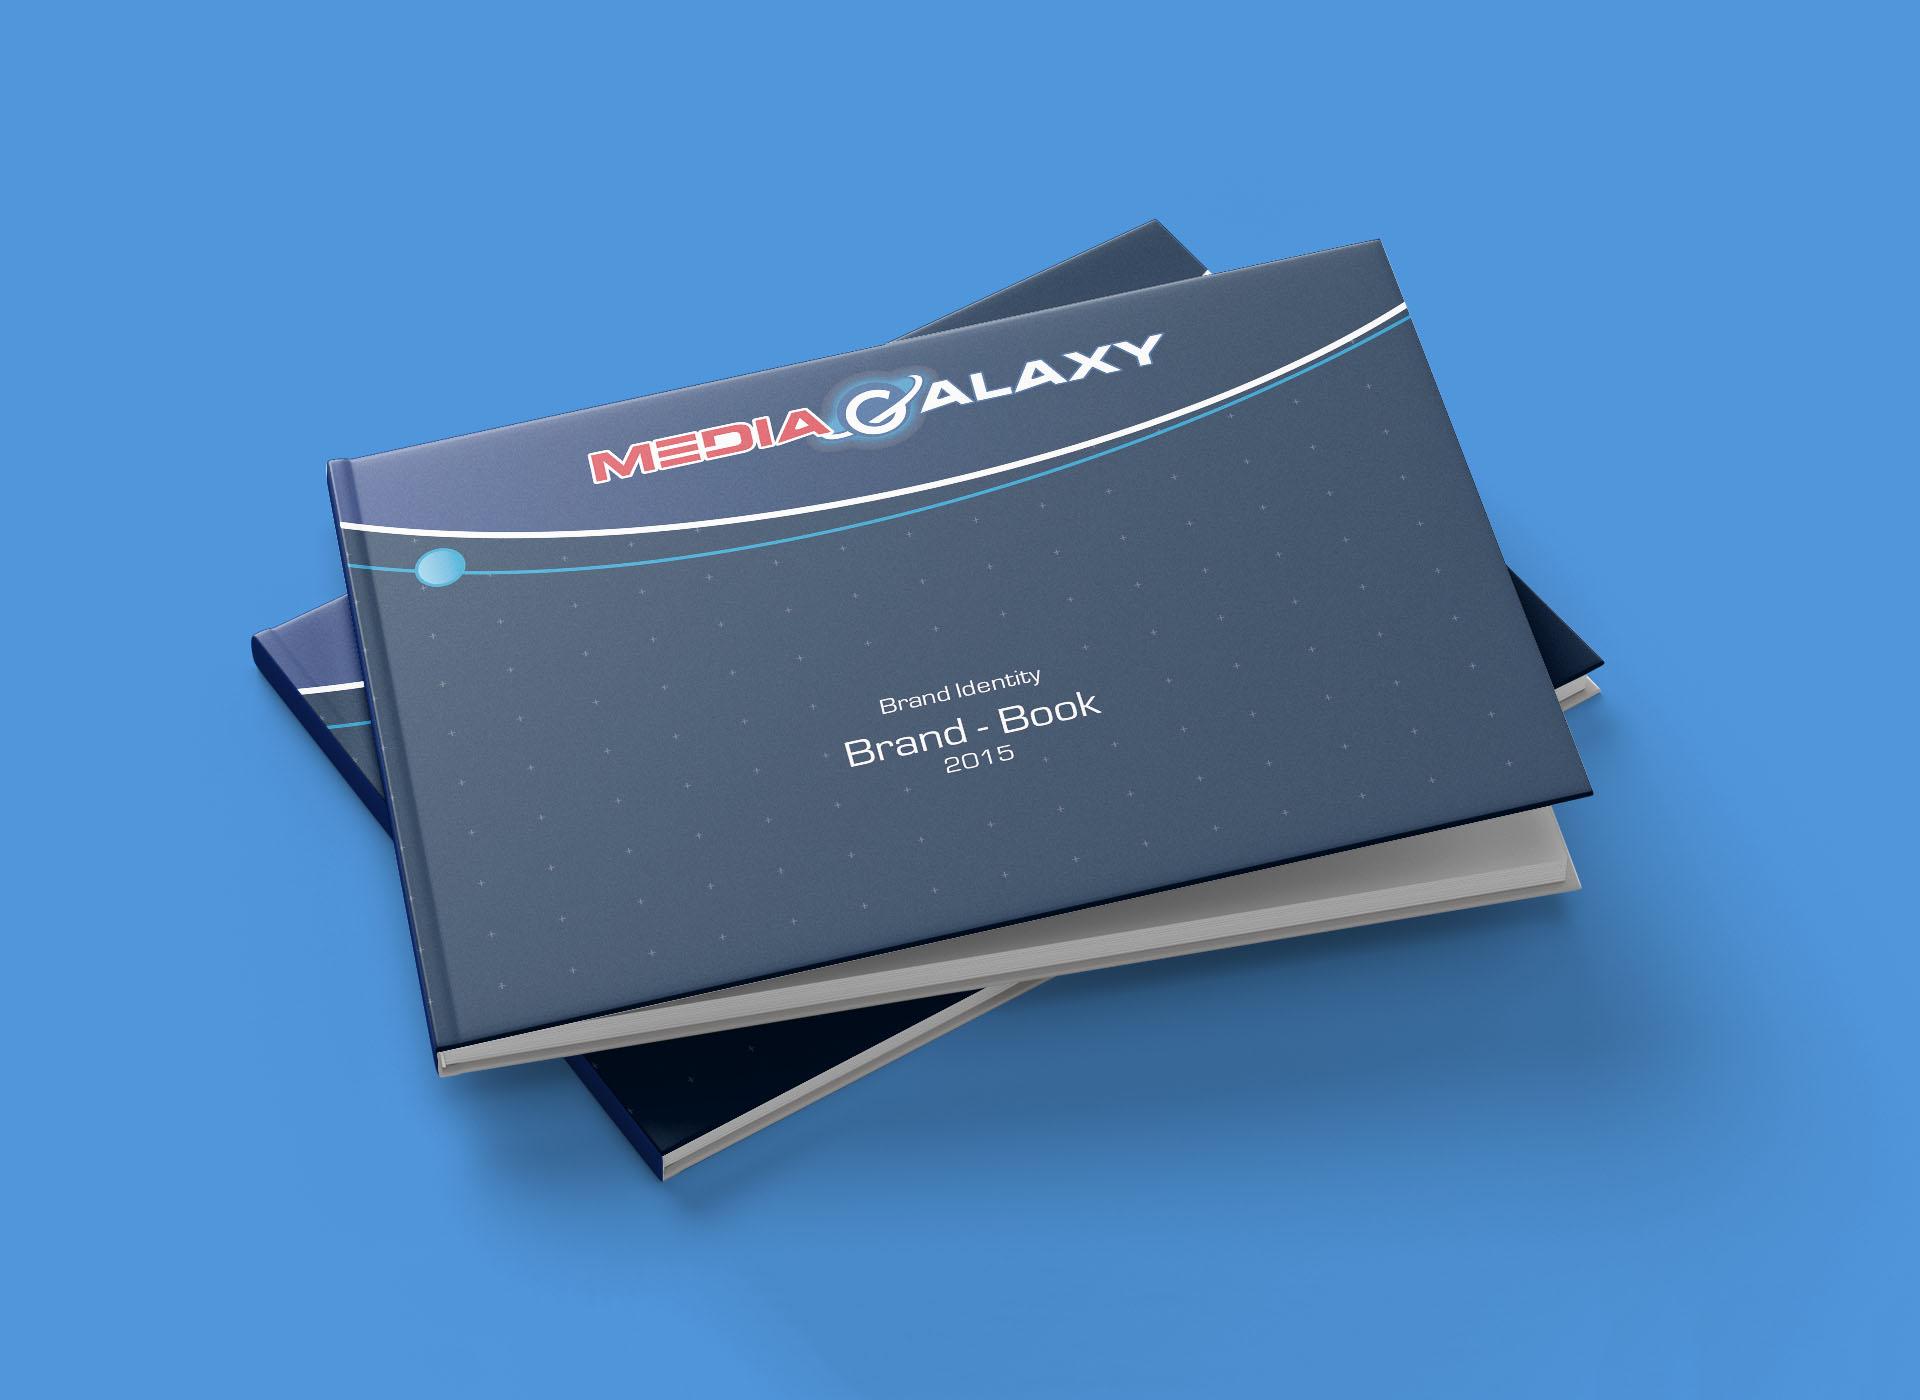 Media Galaxy